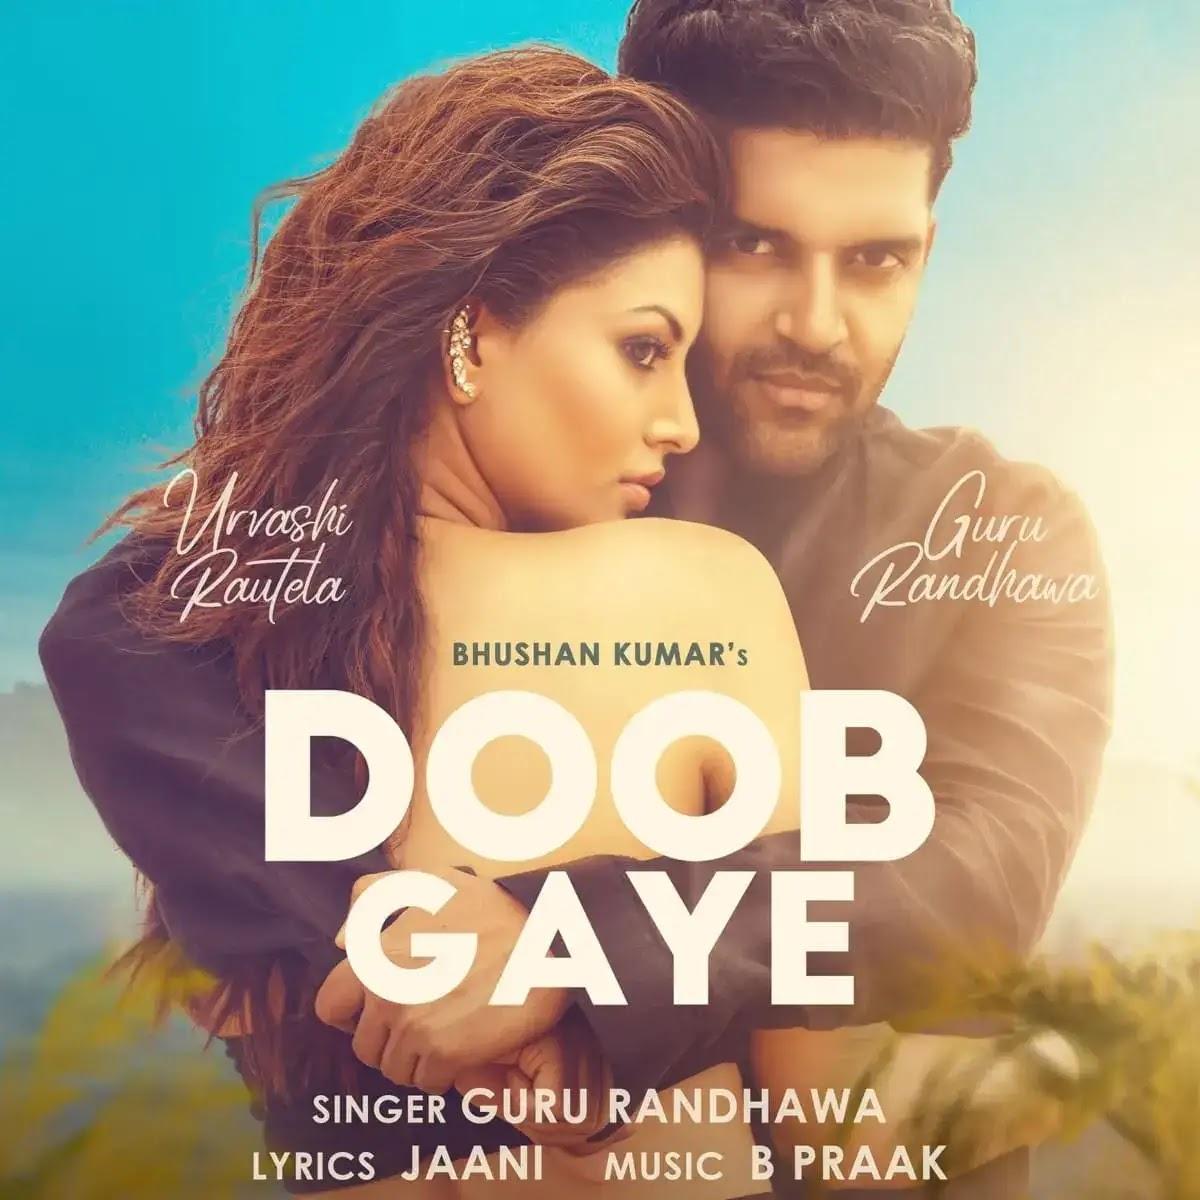 Doob Gaye Guru Randhawa MP3 Song Download With Hindi Lyrics & Full Video Download HD